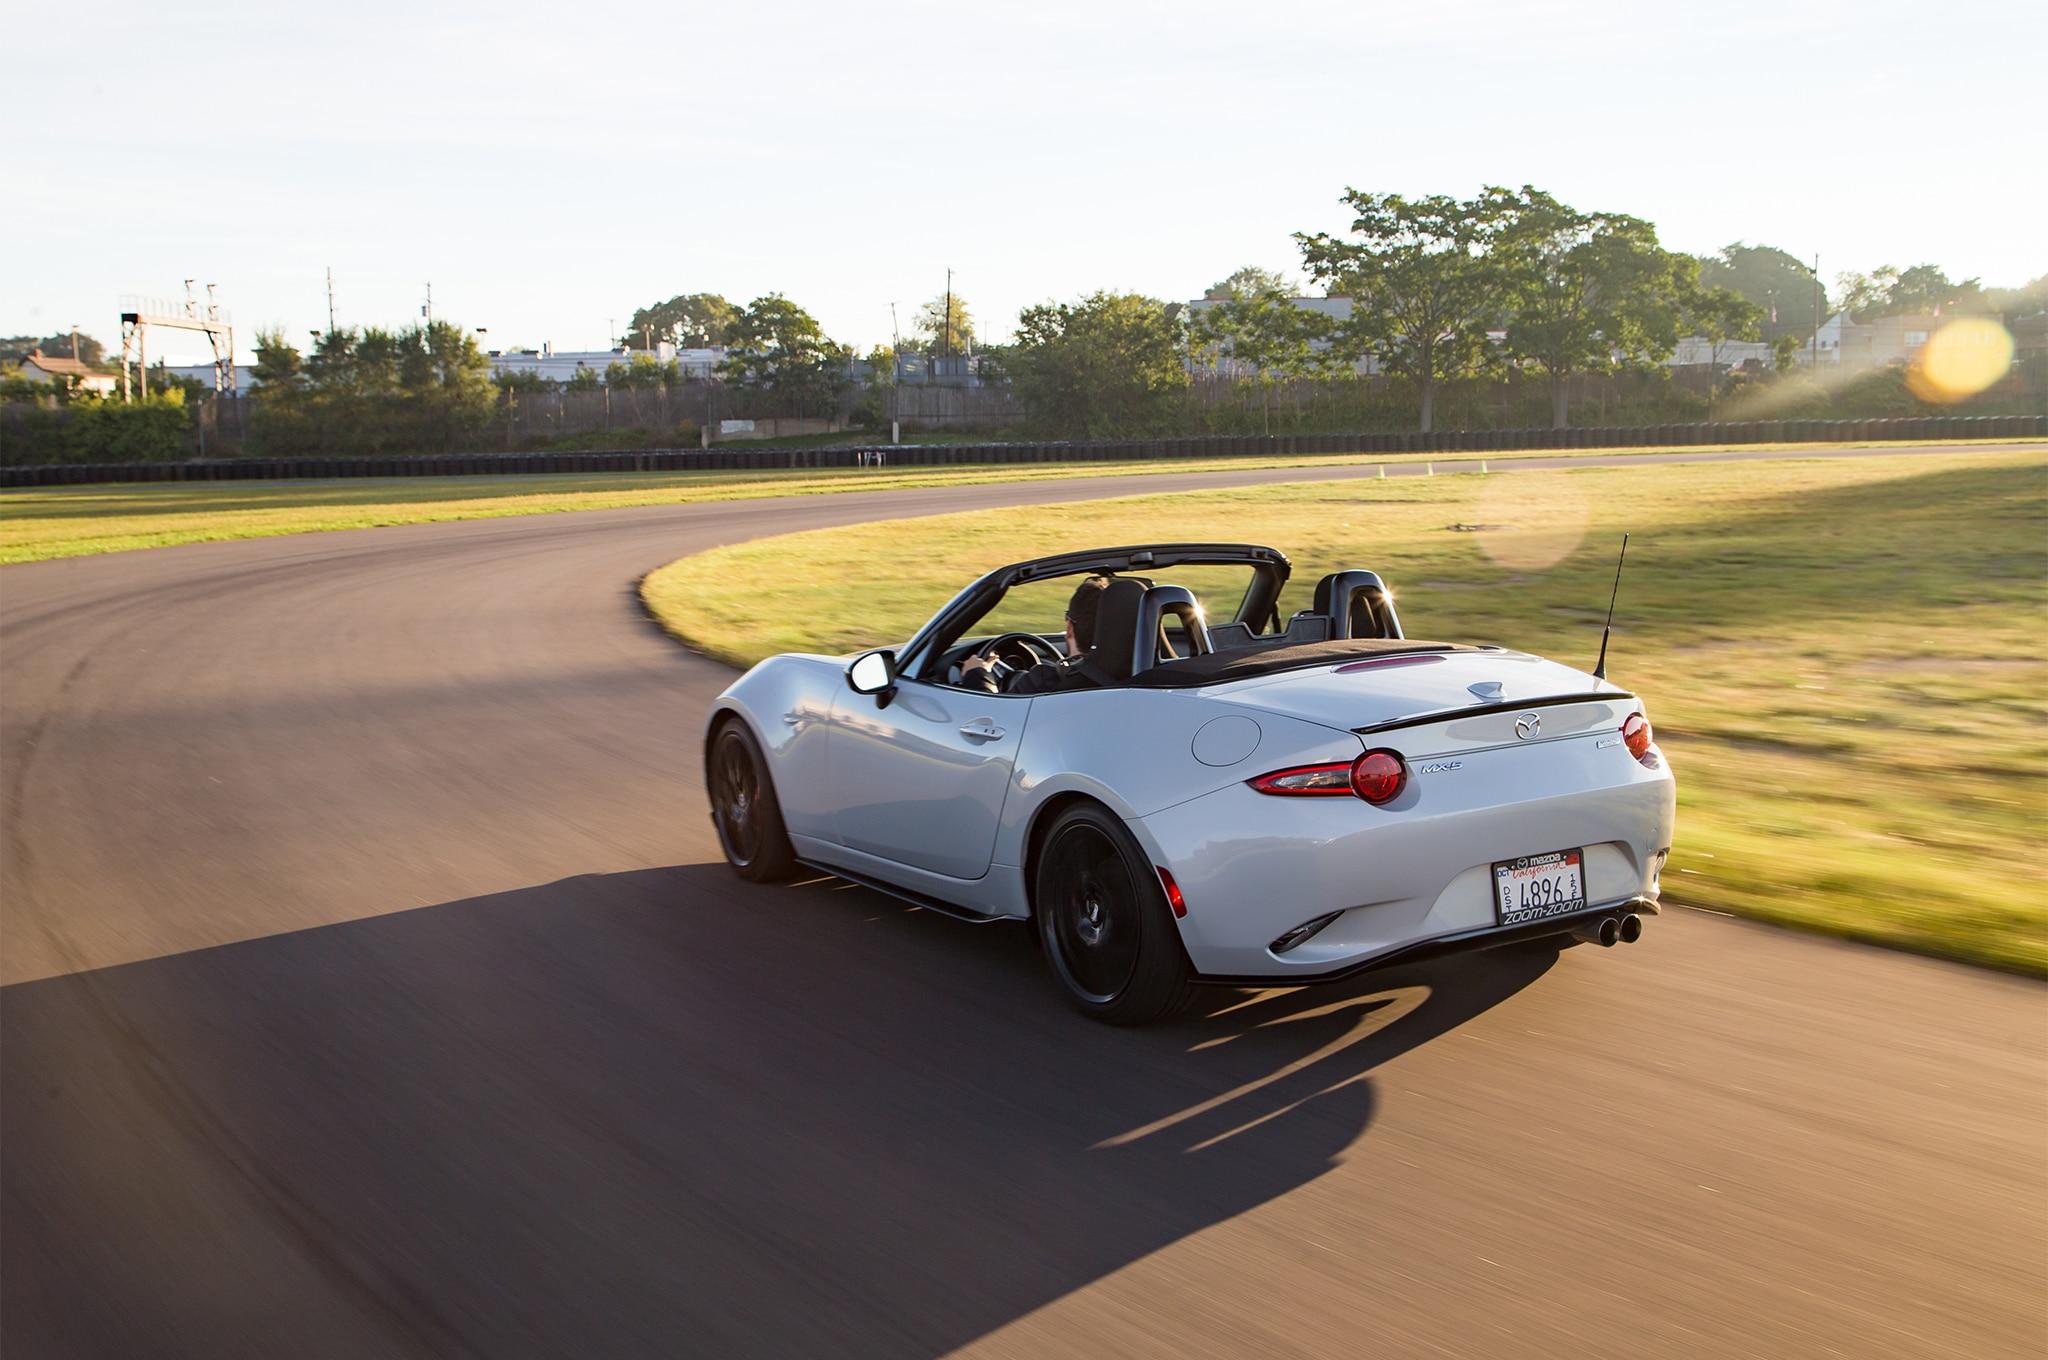 Four Seasons 2016 Mazda MX-5 Miata Club Wrap-Up | Automobile